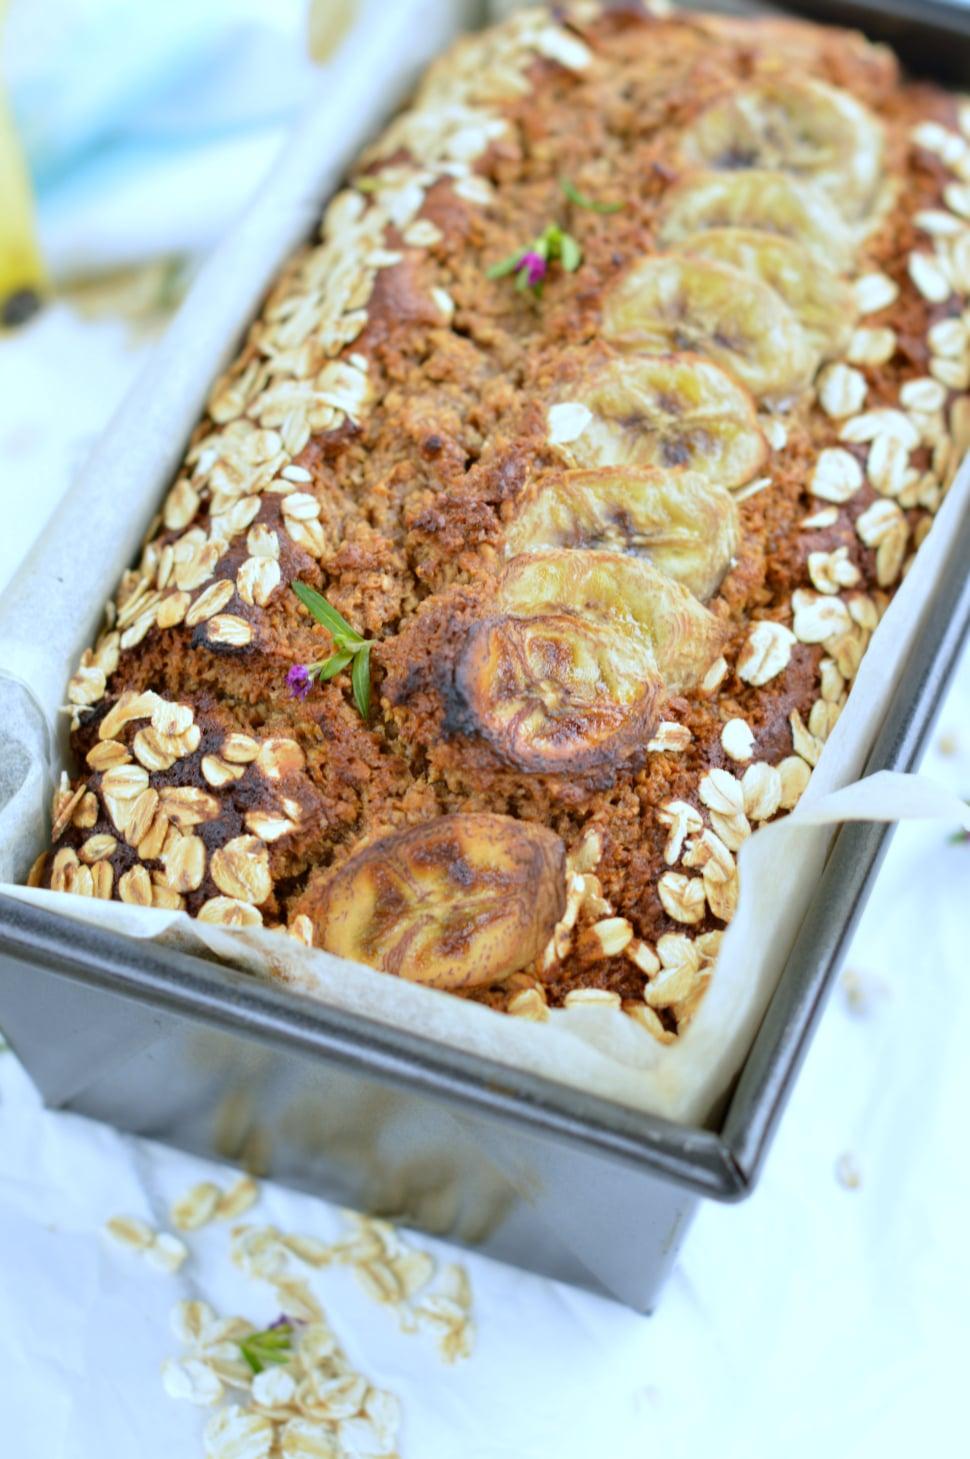 Oatmeal banana bread | Eggless banana bread